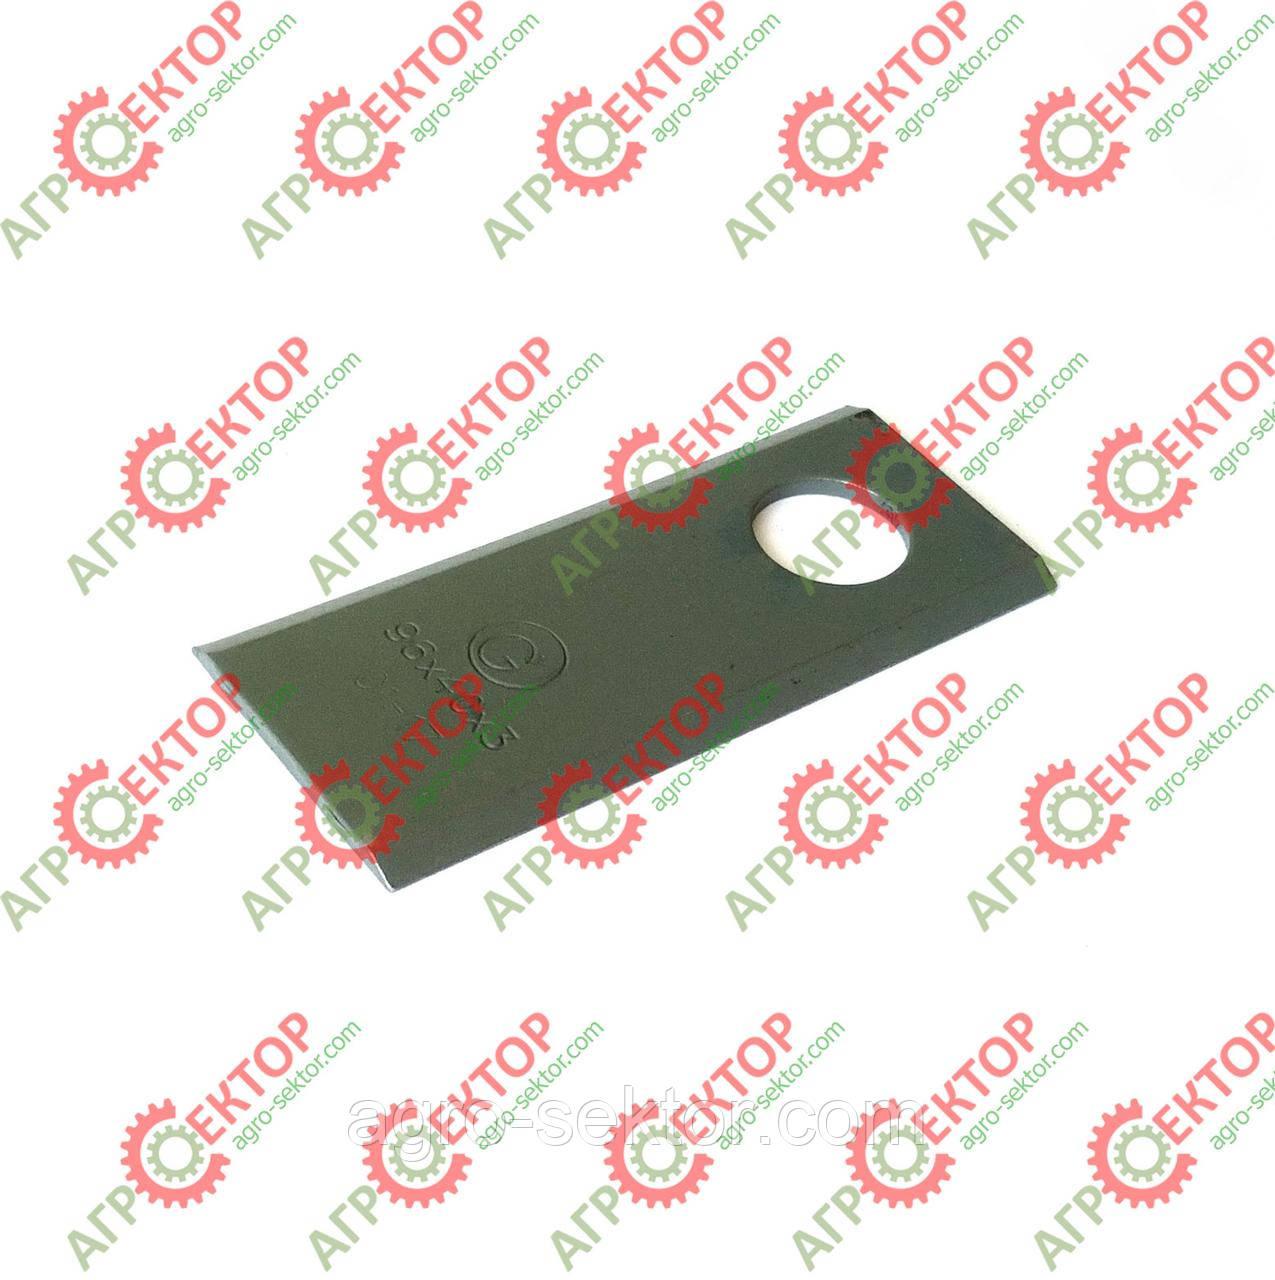 Ніж роторної косарки Wirax Z-069, Z-169 503601045